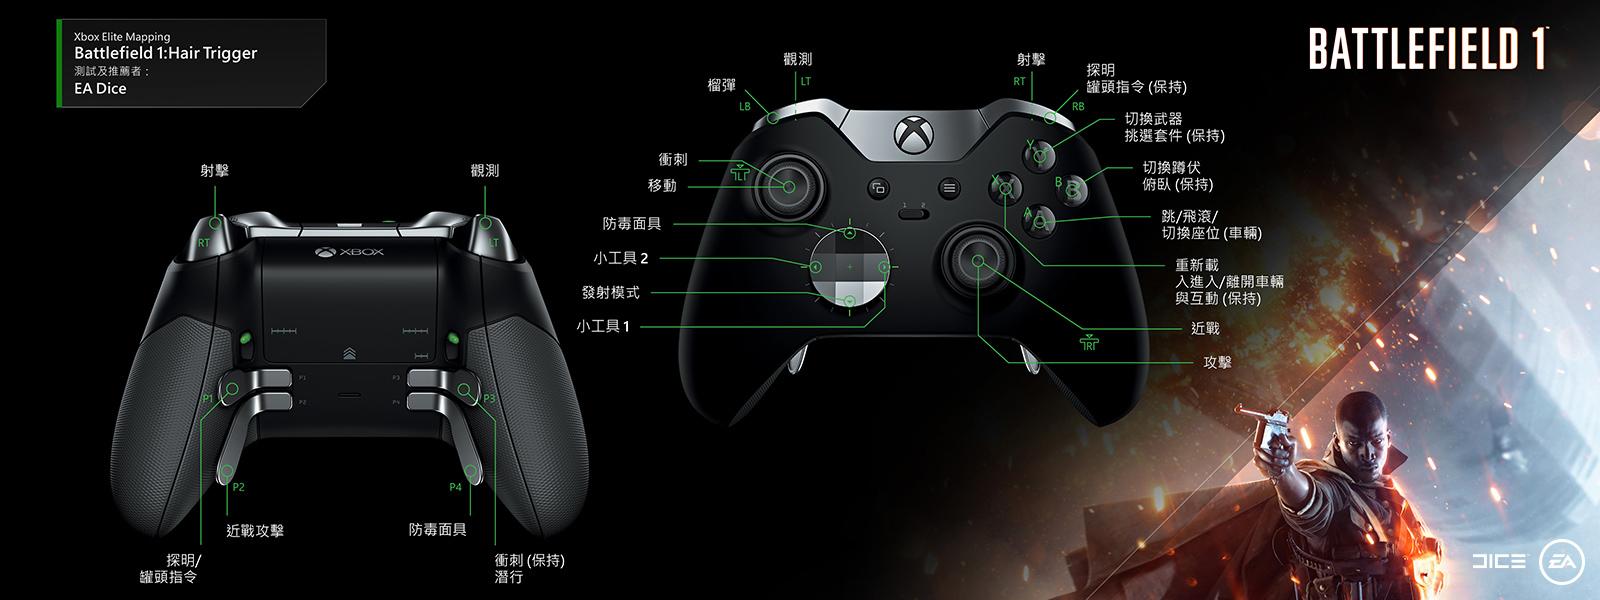 Battlefield 1 – 高感應發射鍵配對功能